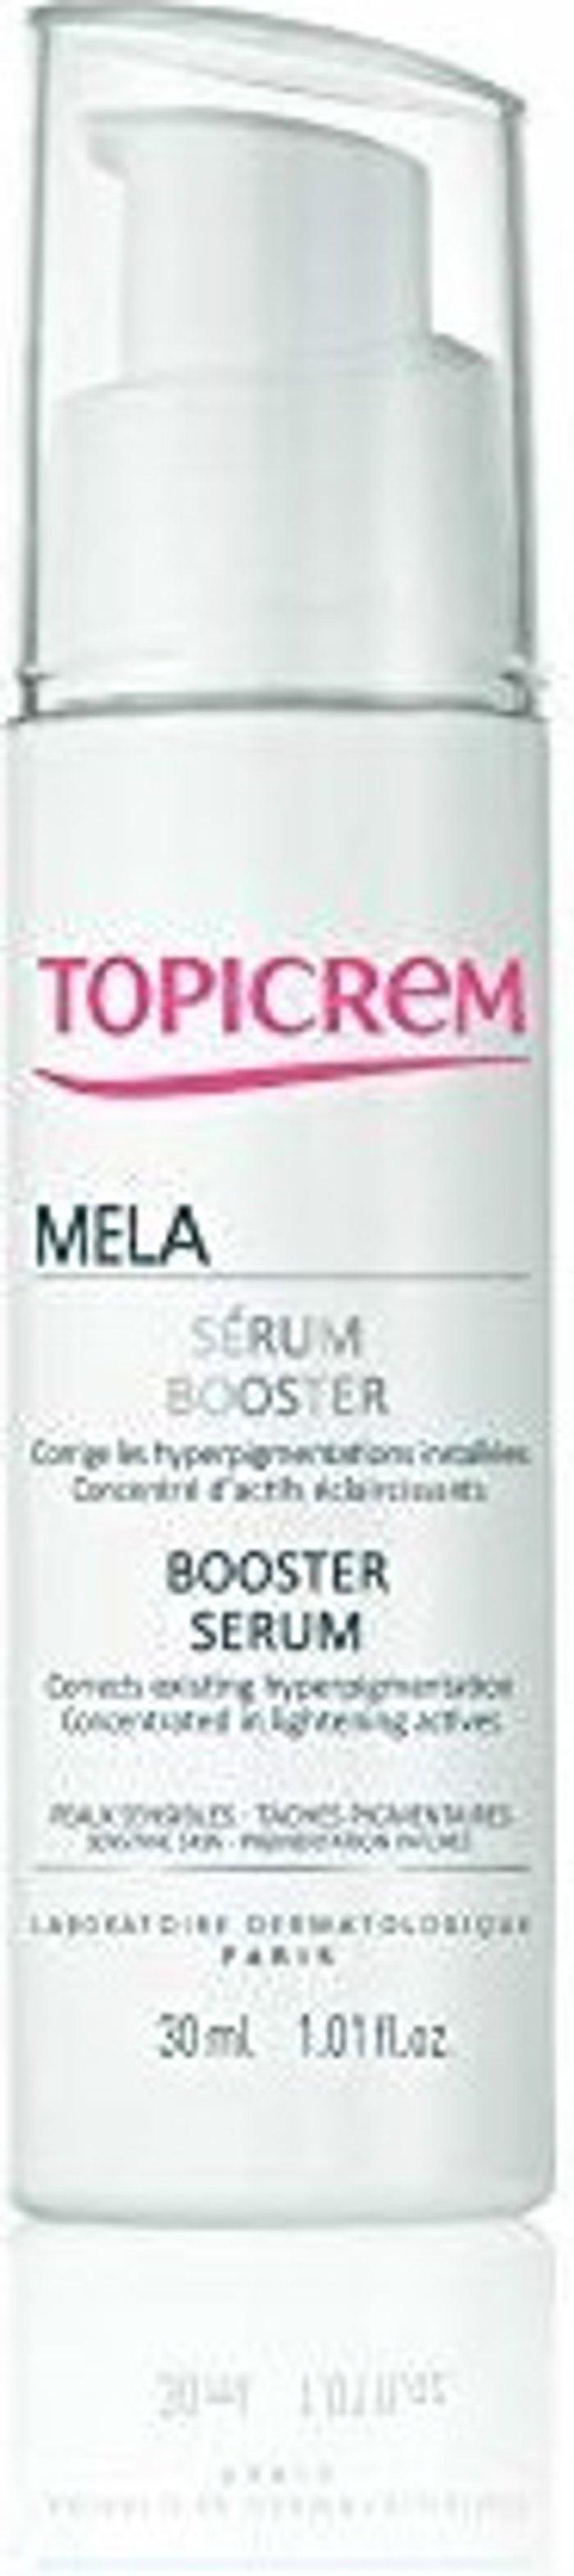 Topicrem Topicrem Mela Booster Serum (30ml)